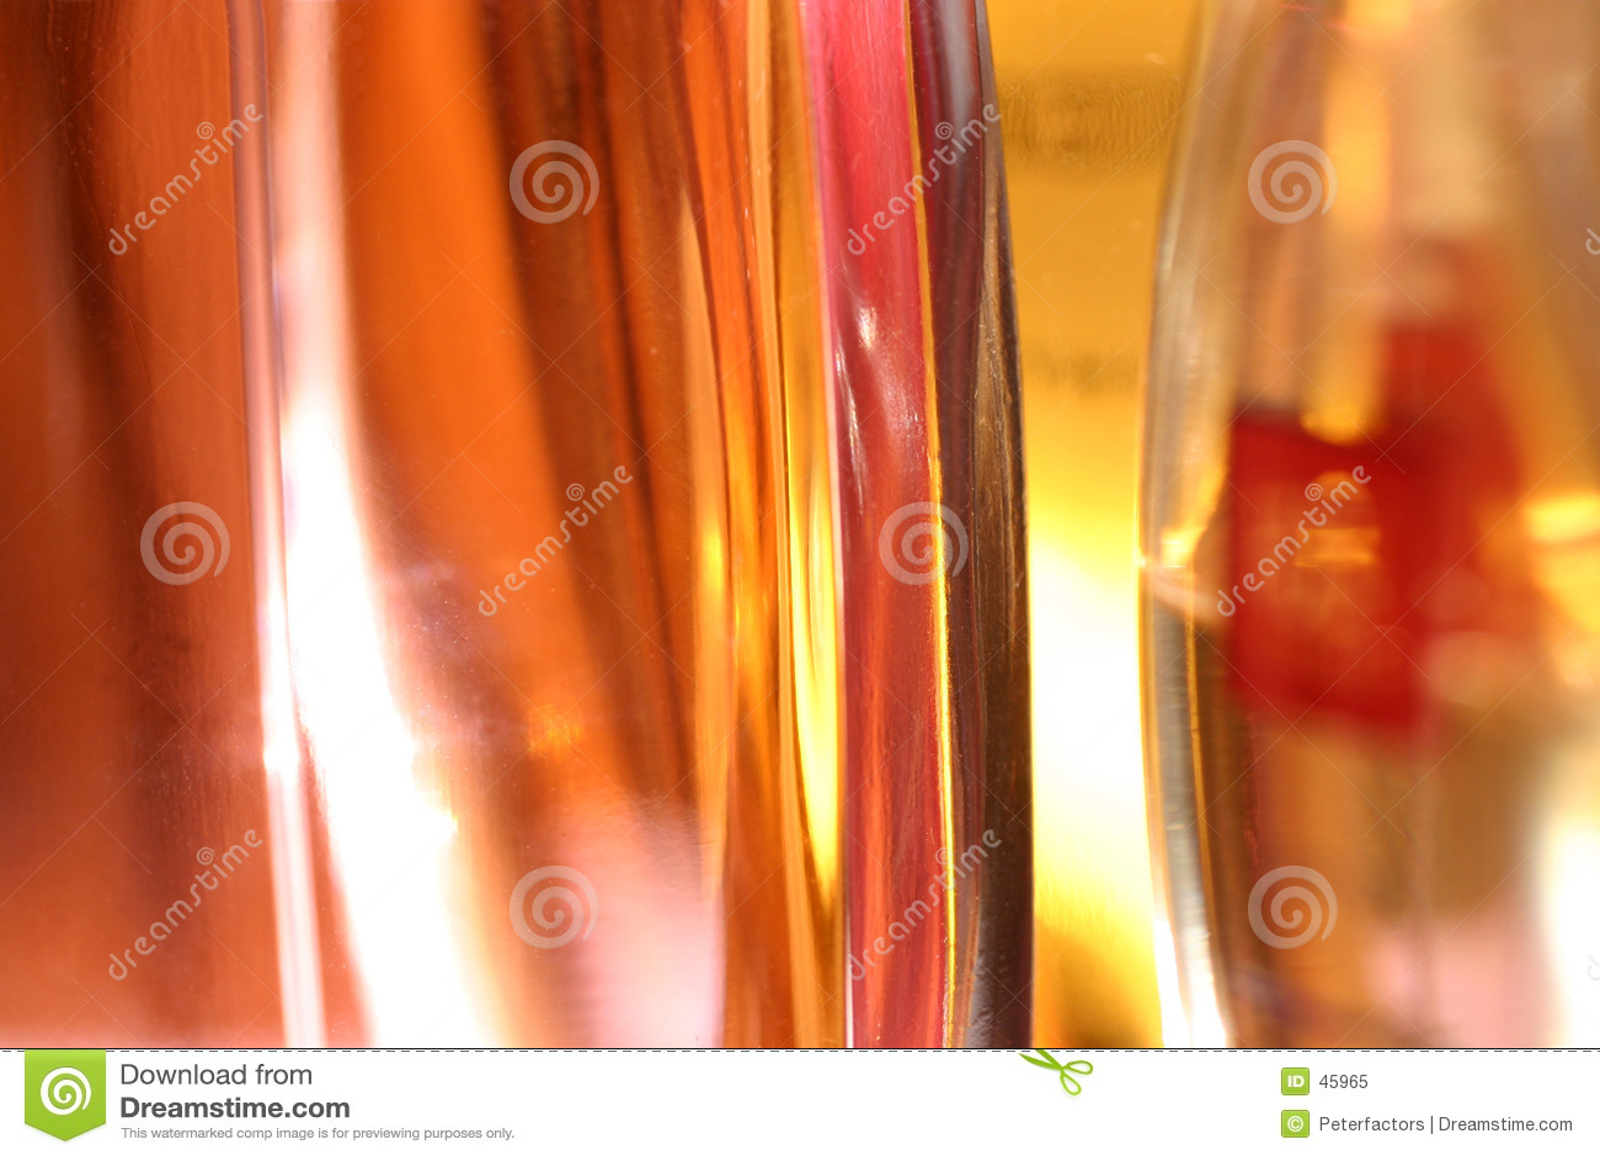 Butelkę perfum